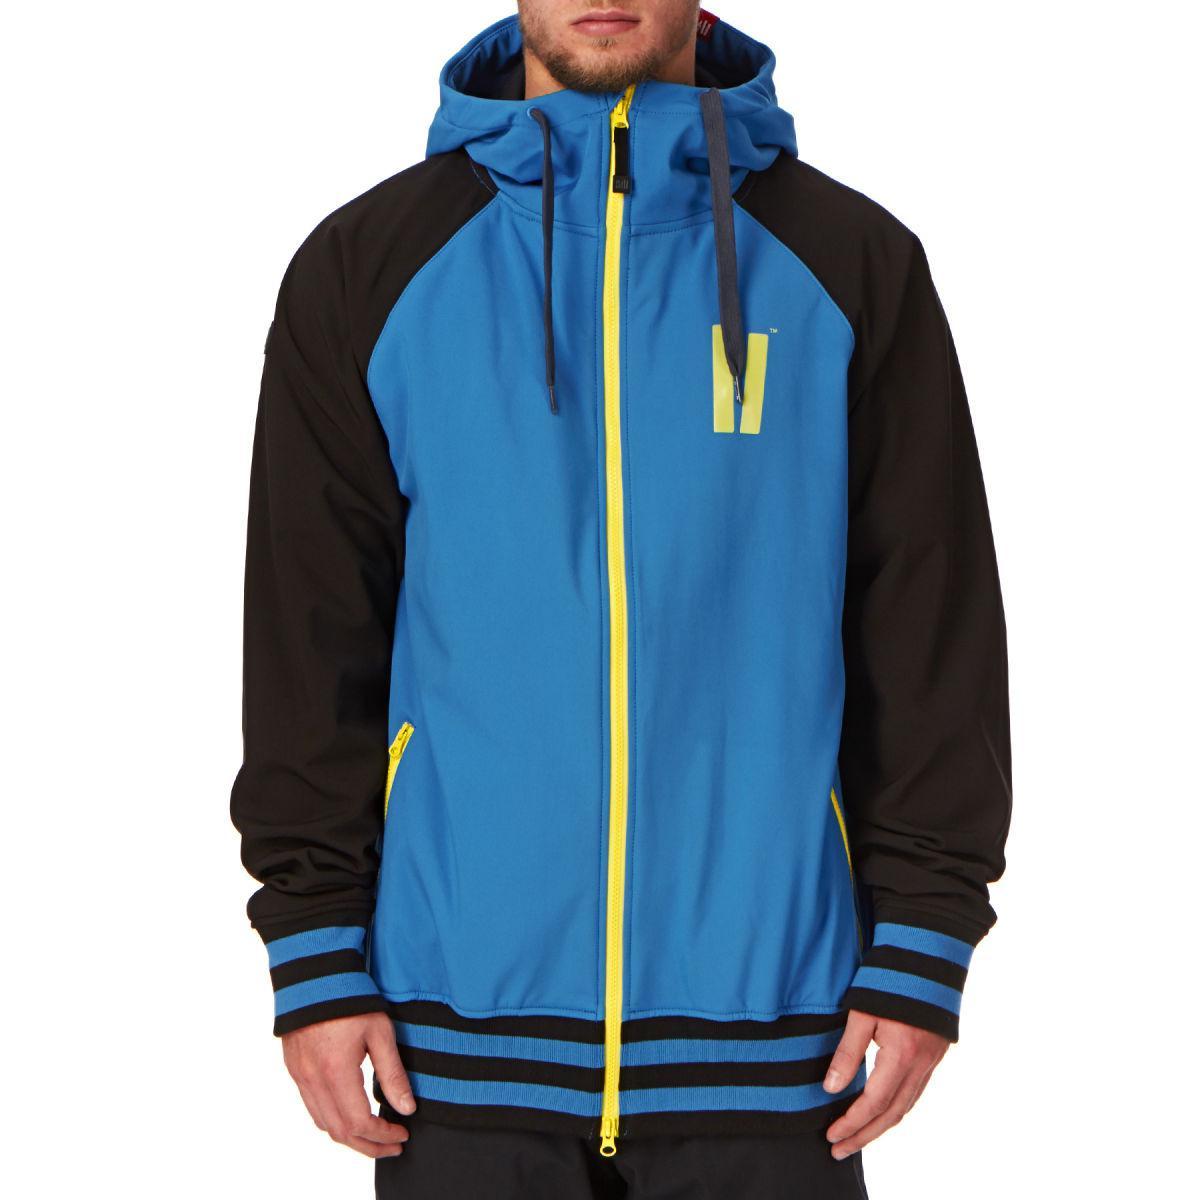 Куртка Planks reunion soft blue/Black L